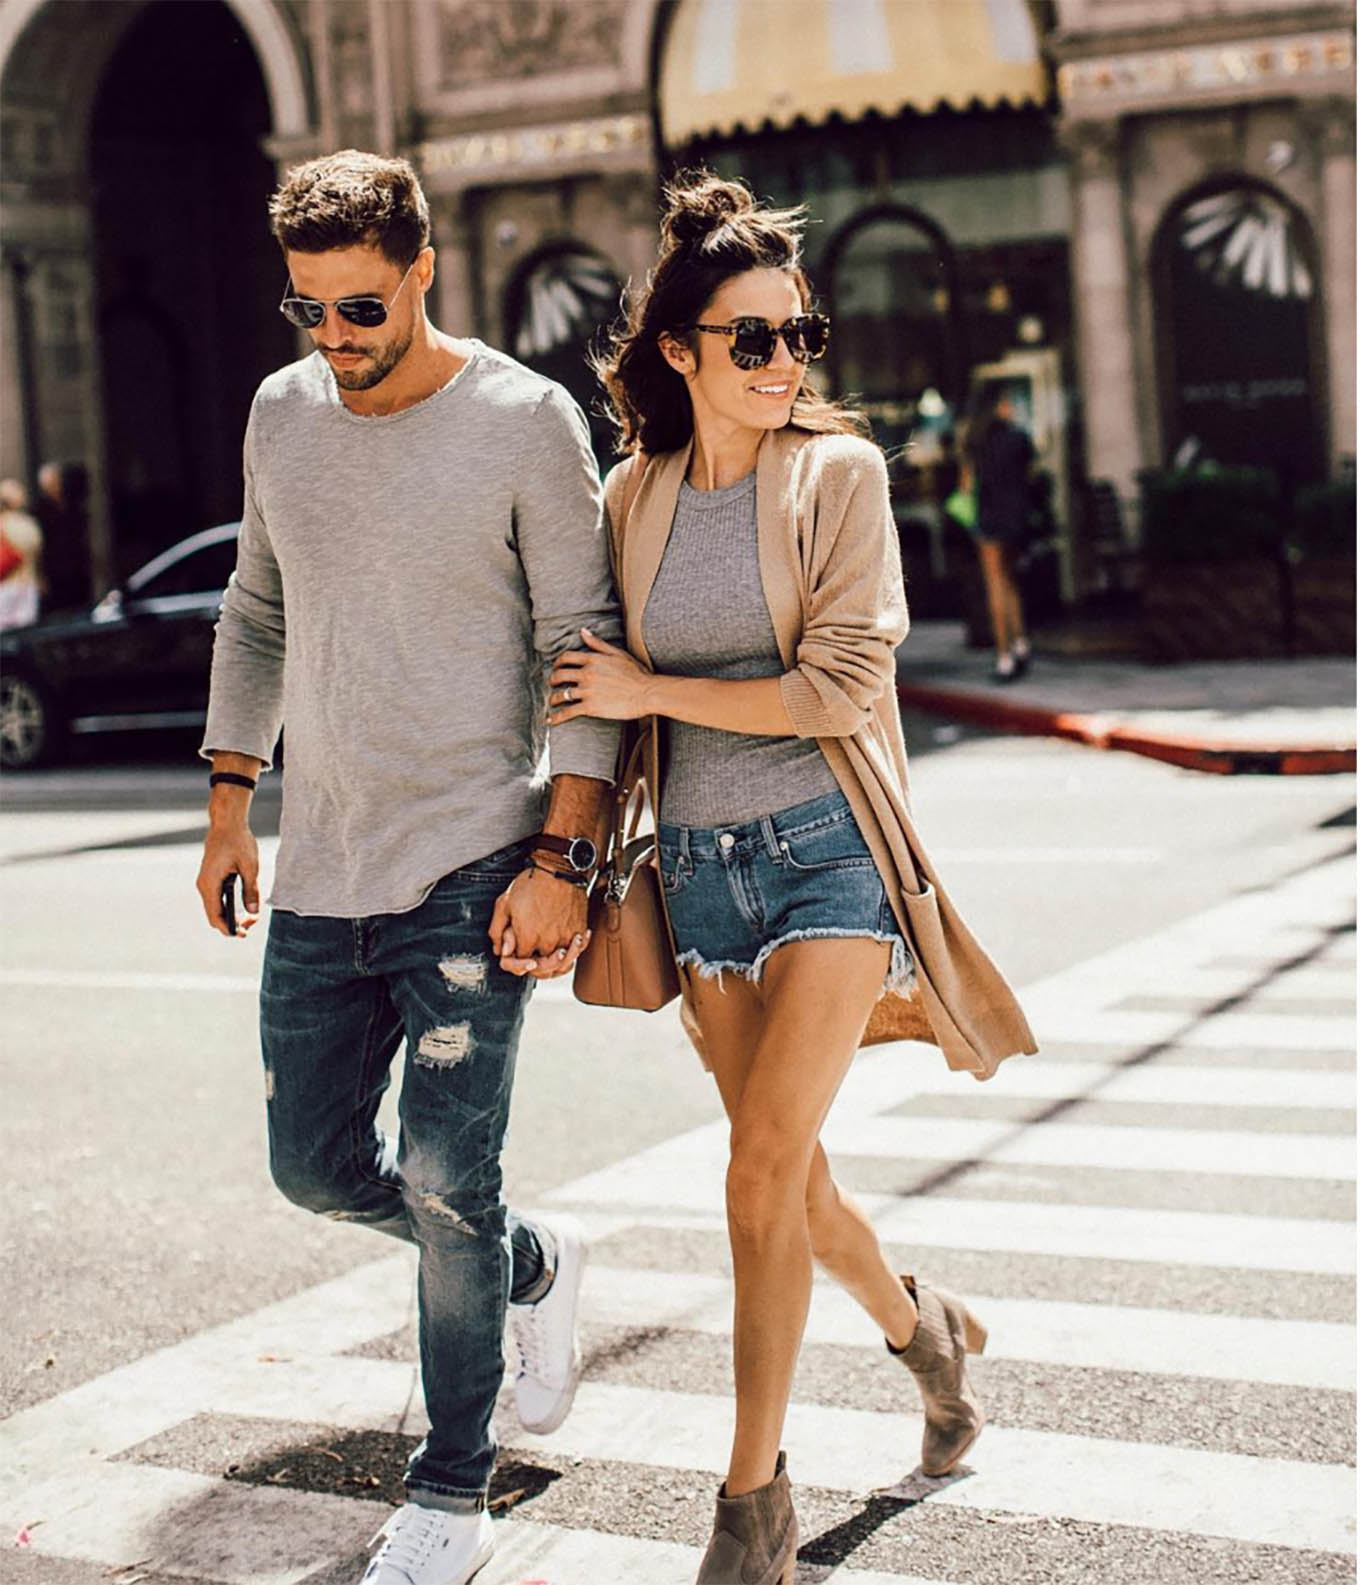 couple's style